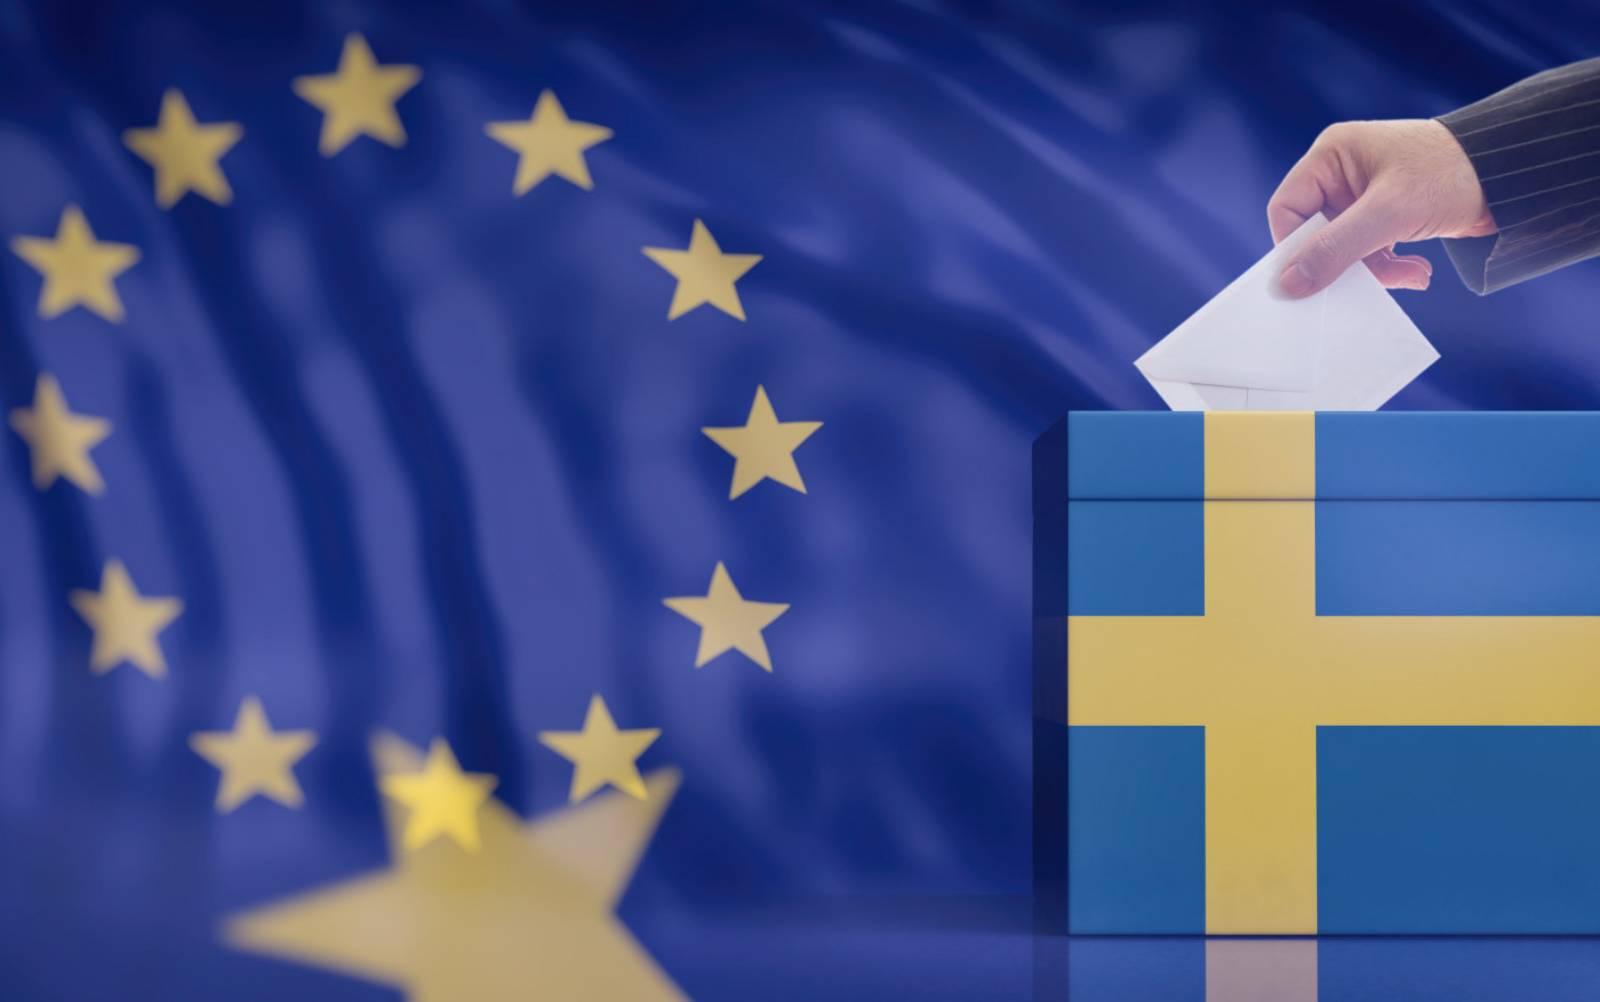 ALEGERI EUROPARLAMENTARE 2019 cum se voteaza